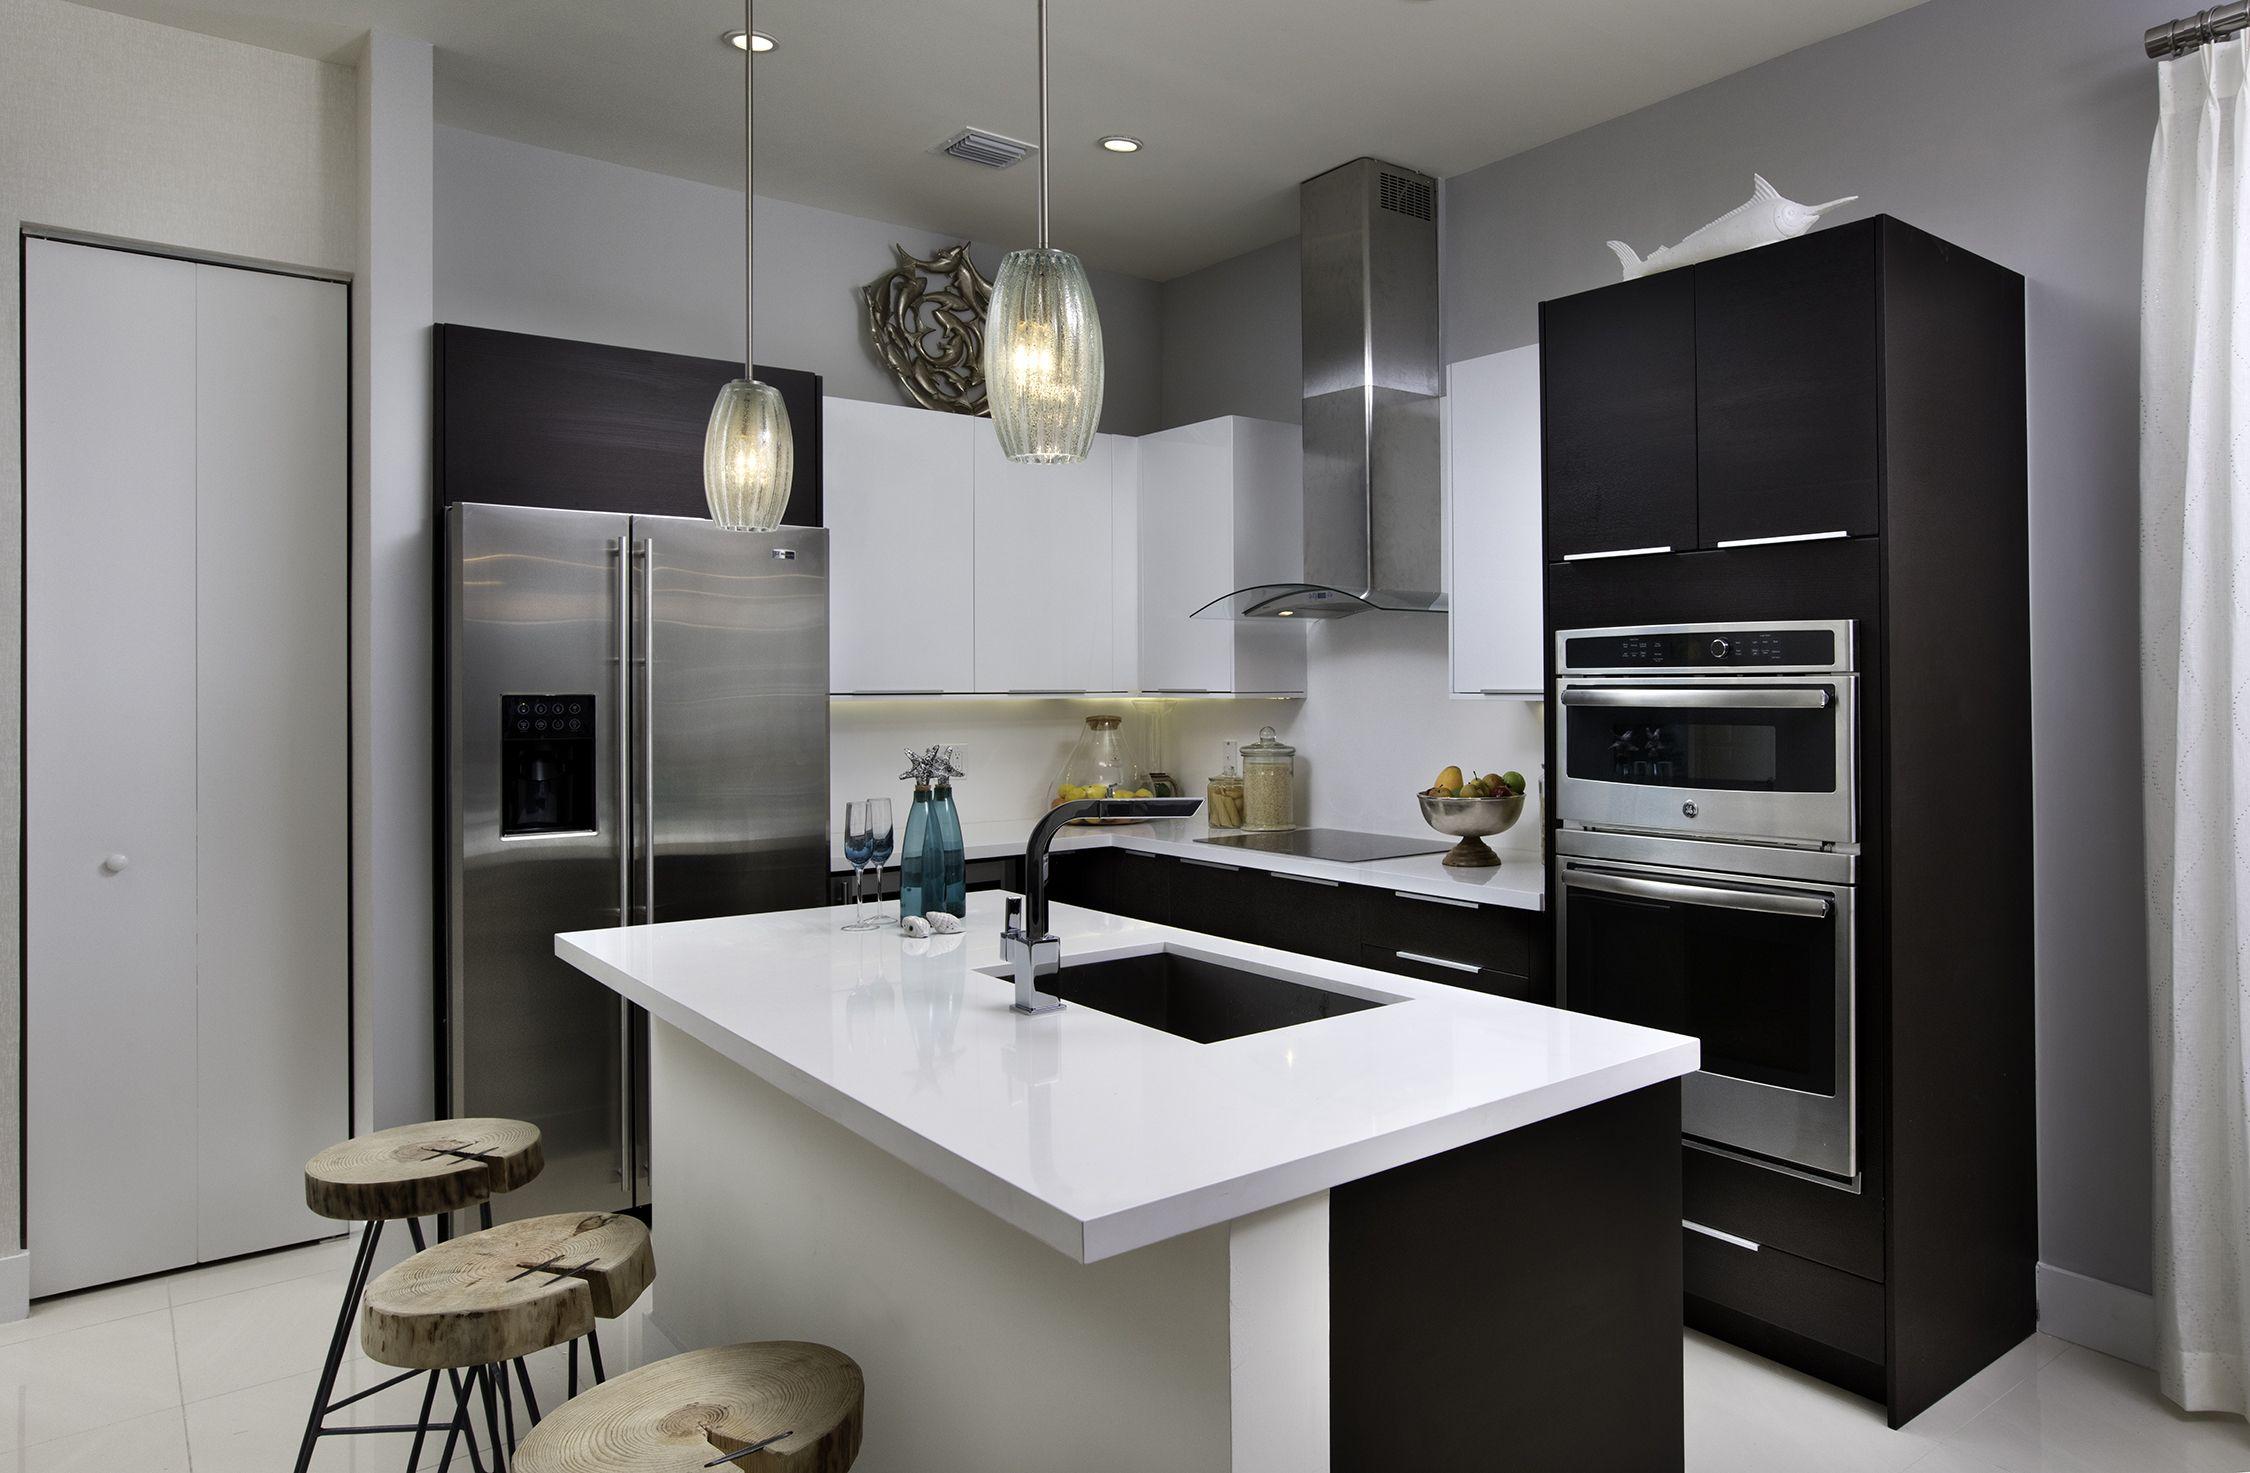 Dream Kitchens Modern Landmark Condominium  Model A  Modern Living Dream Kitchen